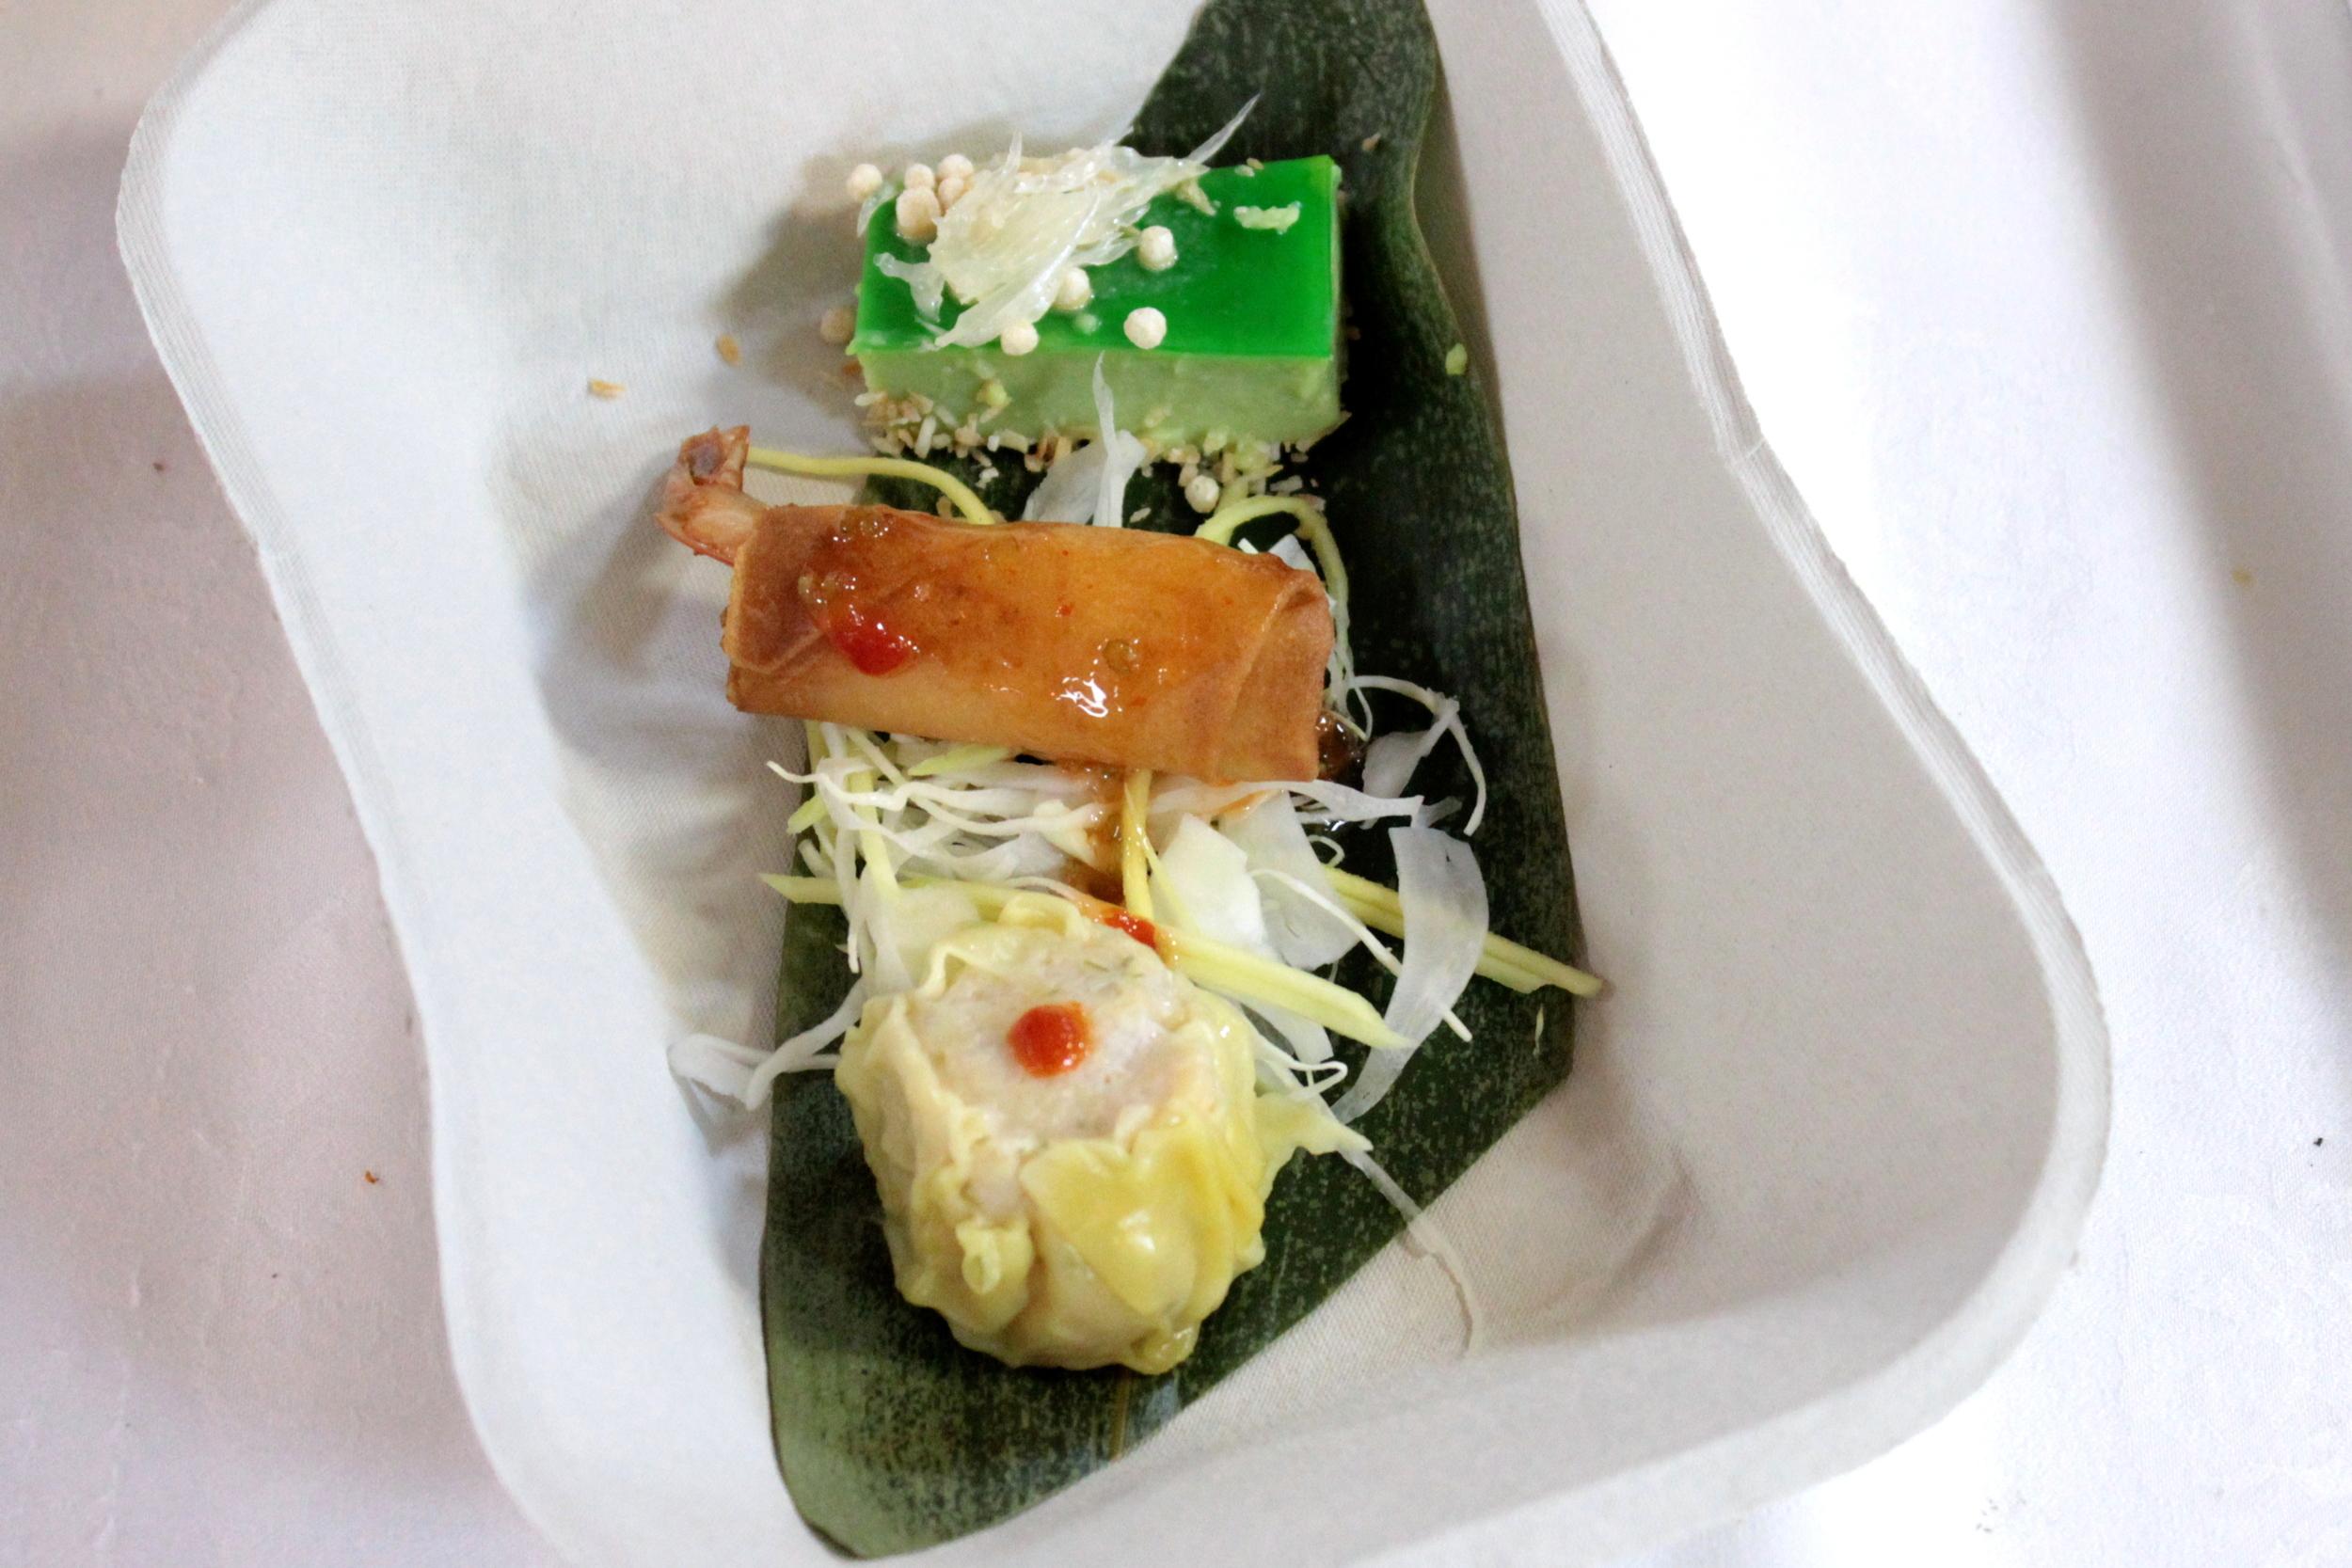 Steamed, Fried & Chilled Dim Sum Trio - Chicken Lemongrass Siu Mai, Prawn and Sticky Rice Roll, Pandan Custard with Dulce de Leche